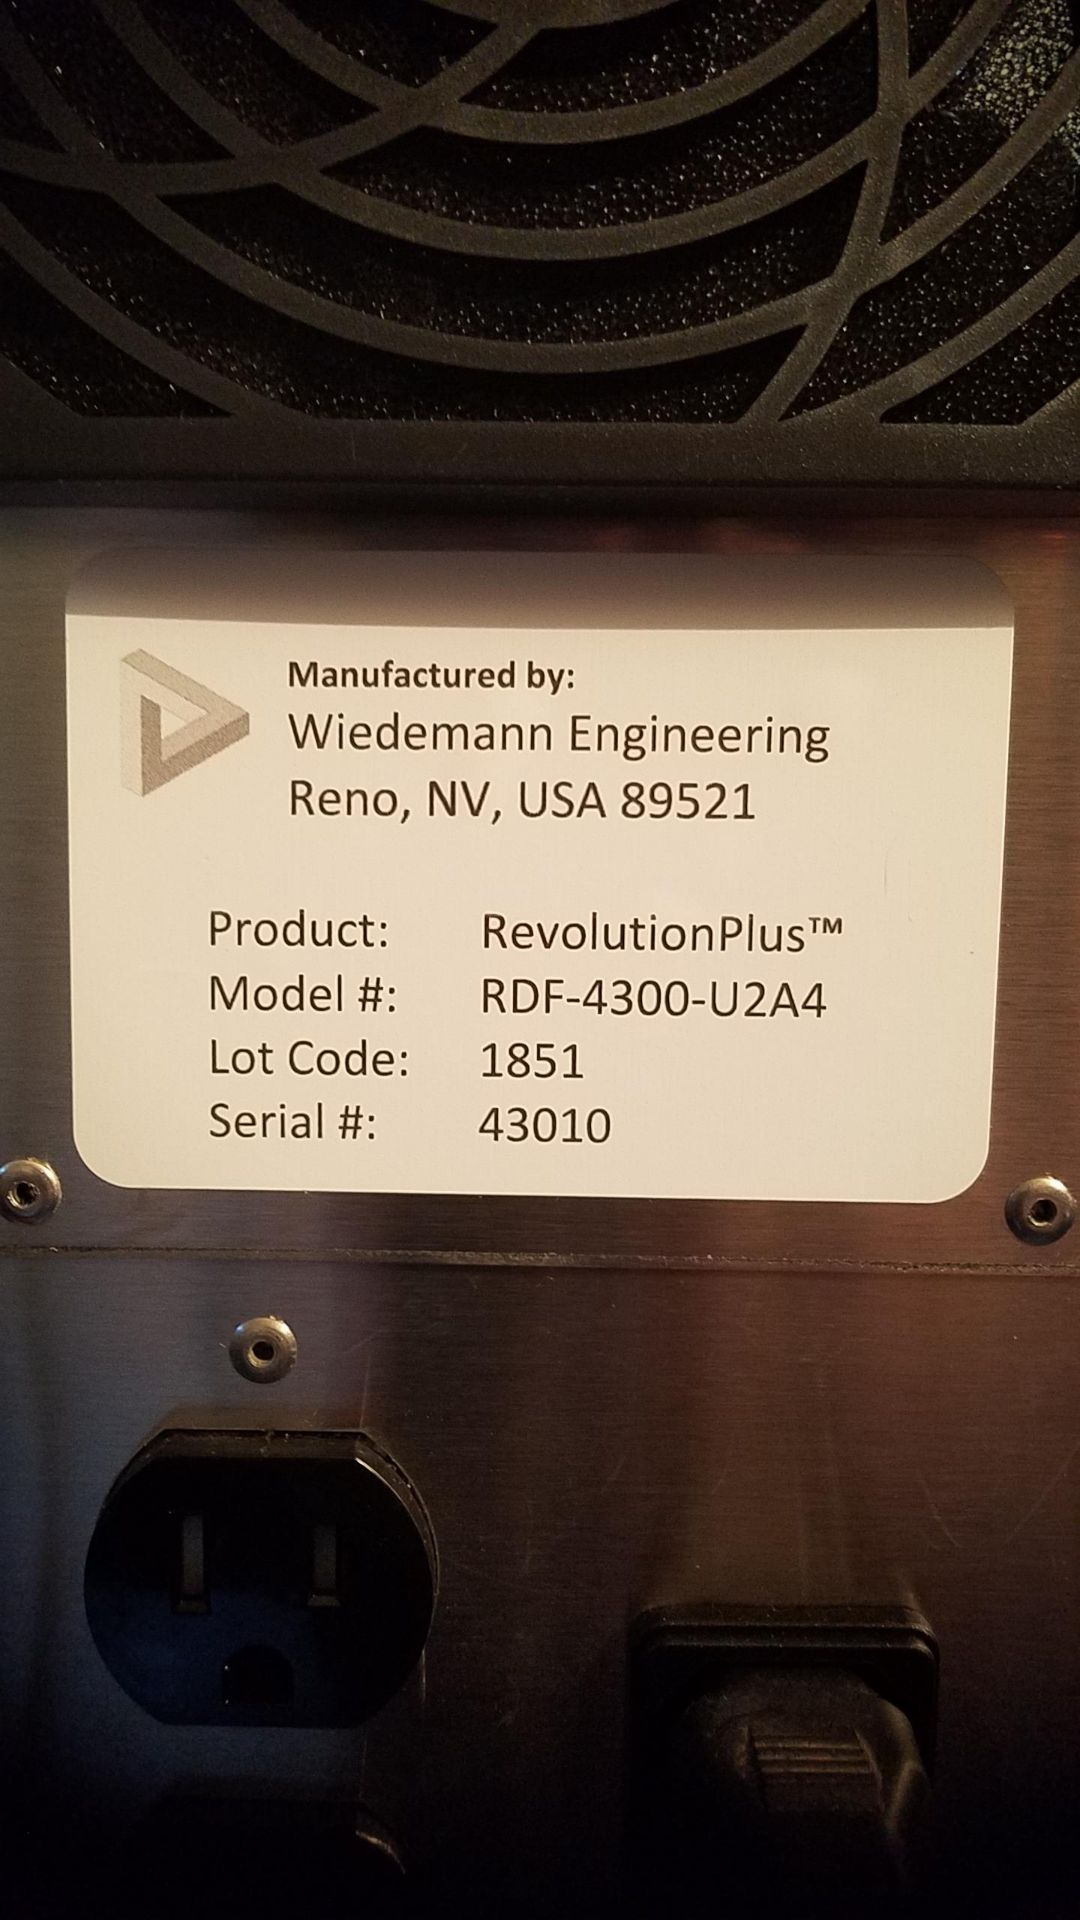 Unused/FactoryNew Revolution Cannabis & Hemp Flower Finisher System Model RDF 4300.100-200 lbs/8 hrs - Image 10 of 32